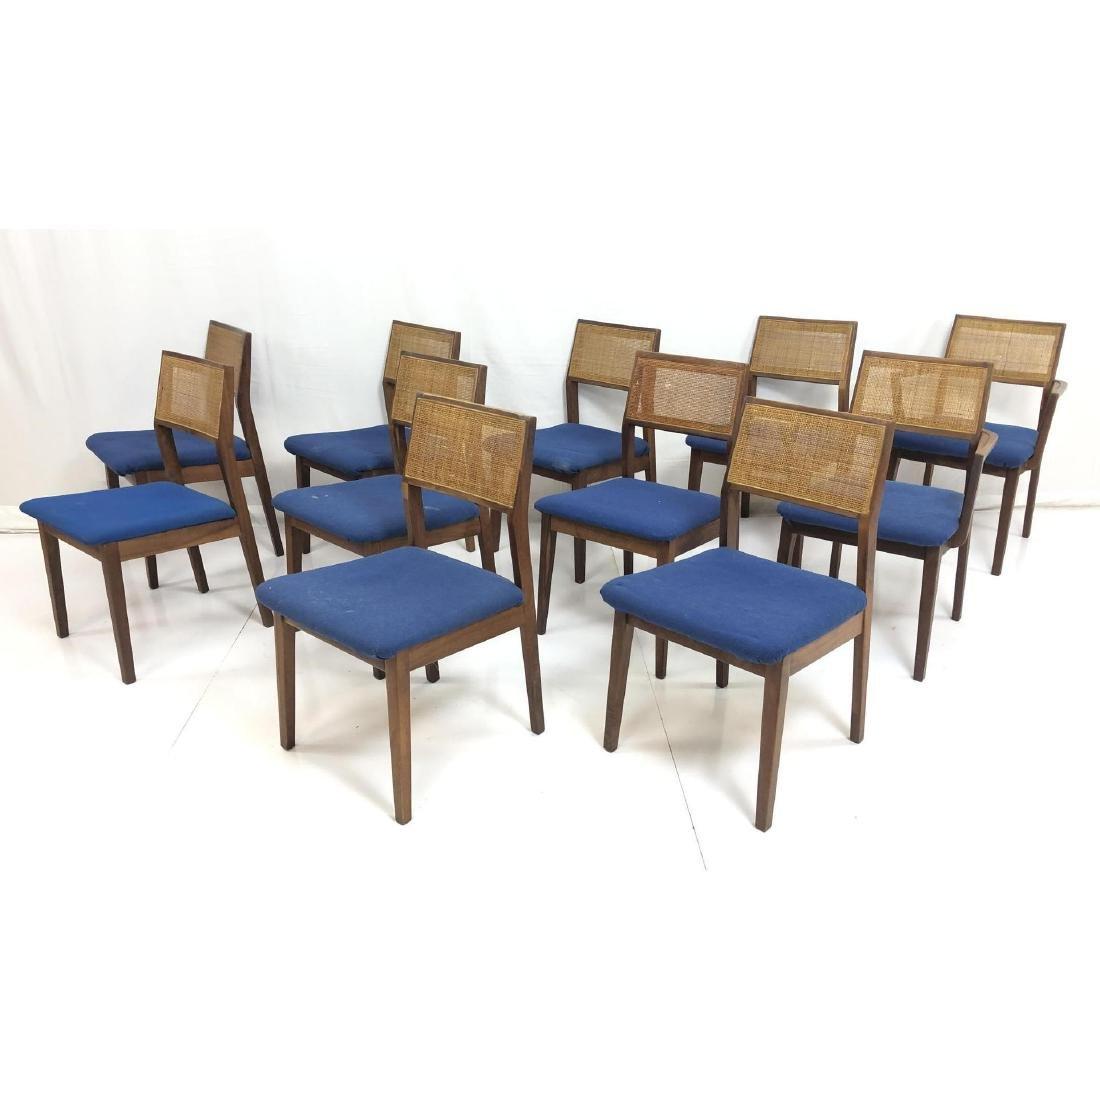 Set 11 Modernist Cane Back Walnut Dining Chairs.